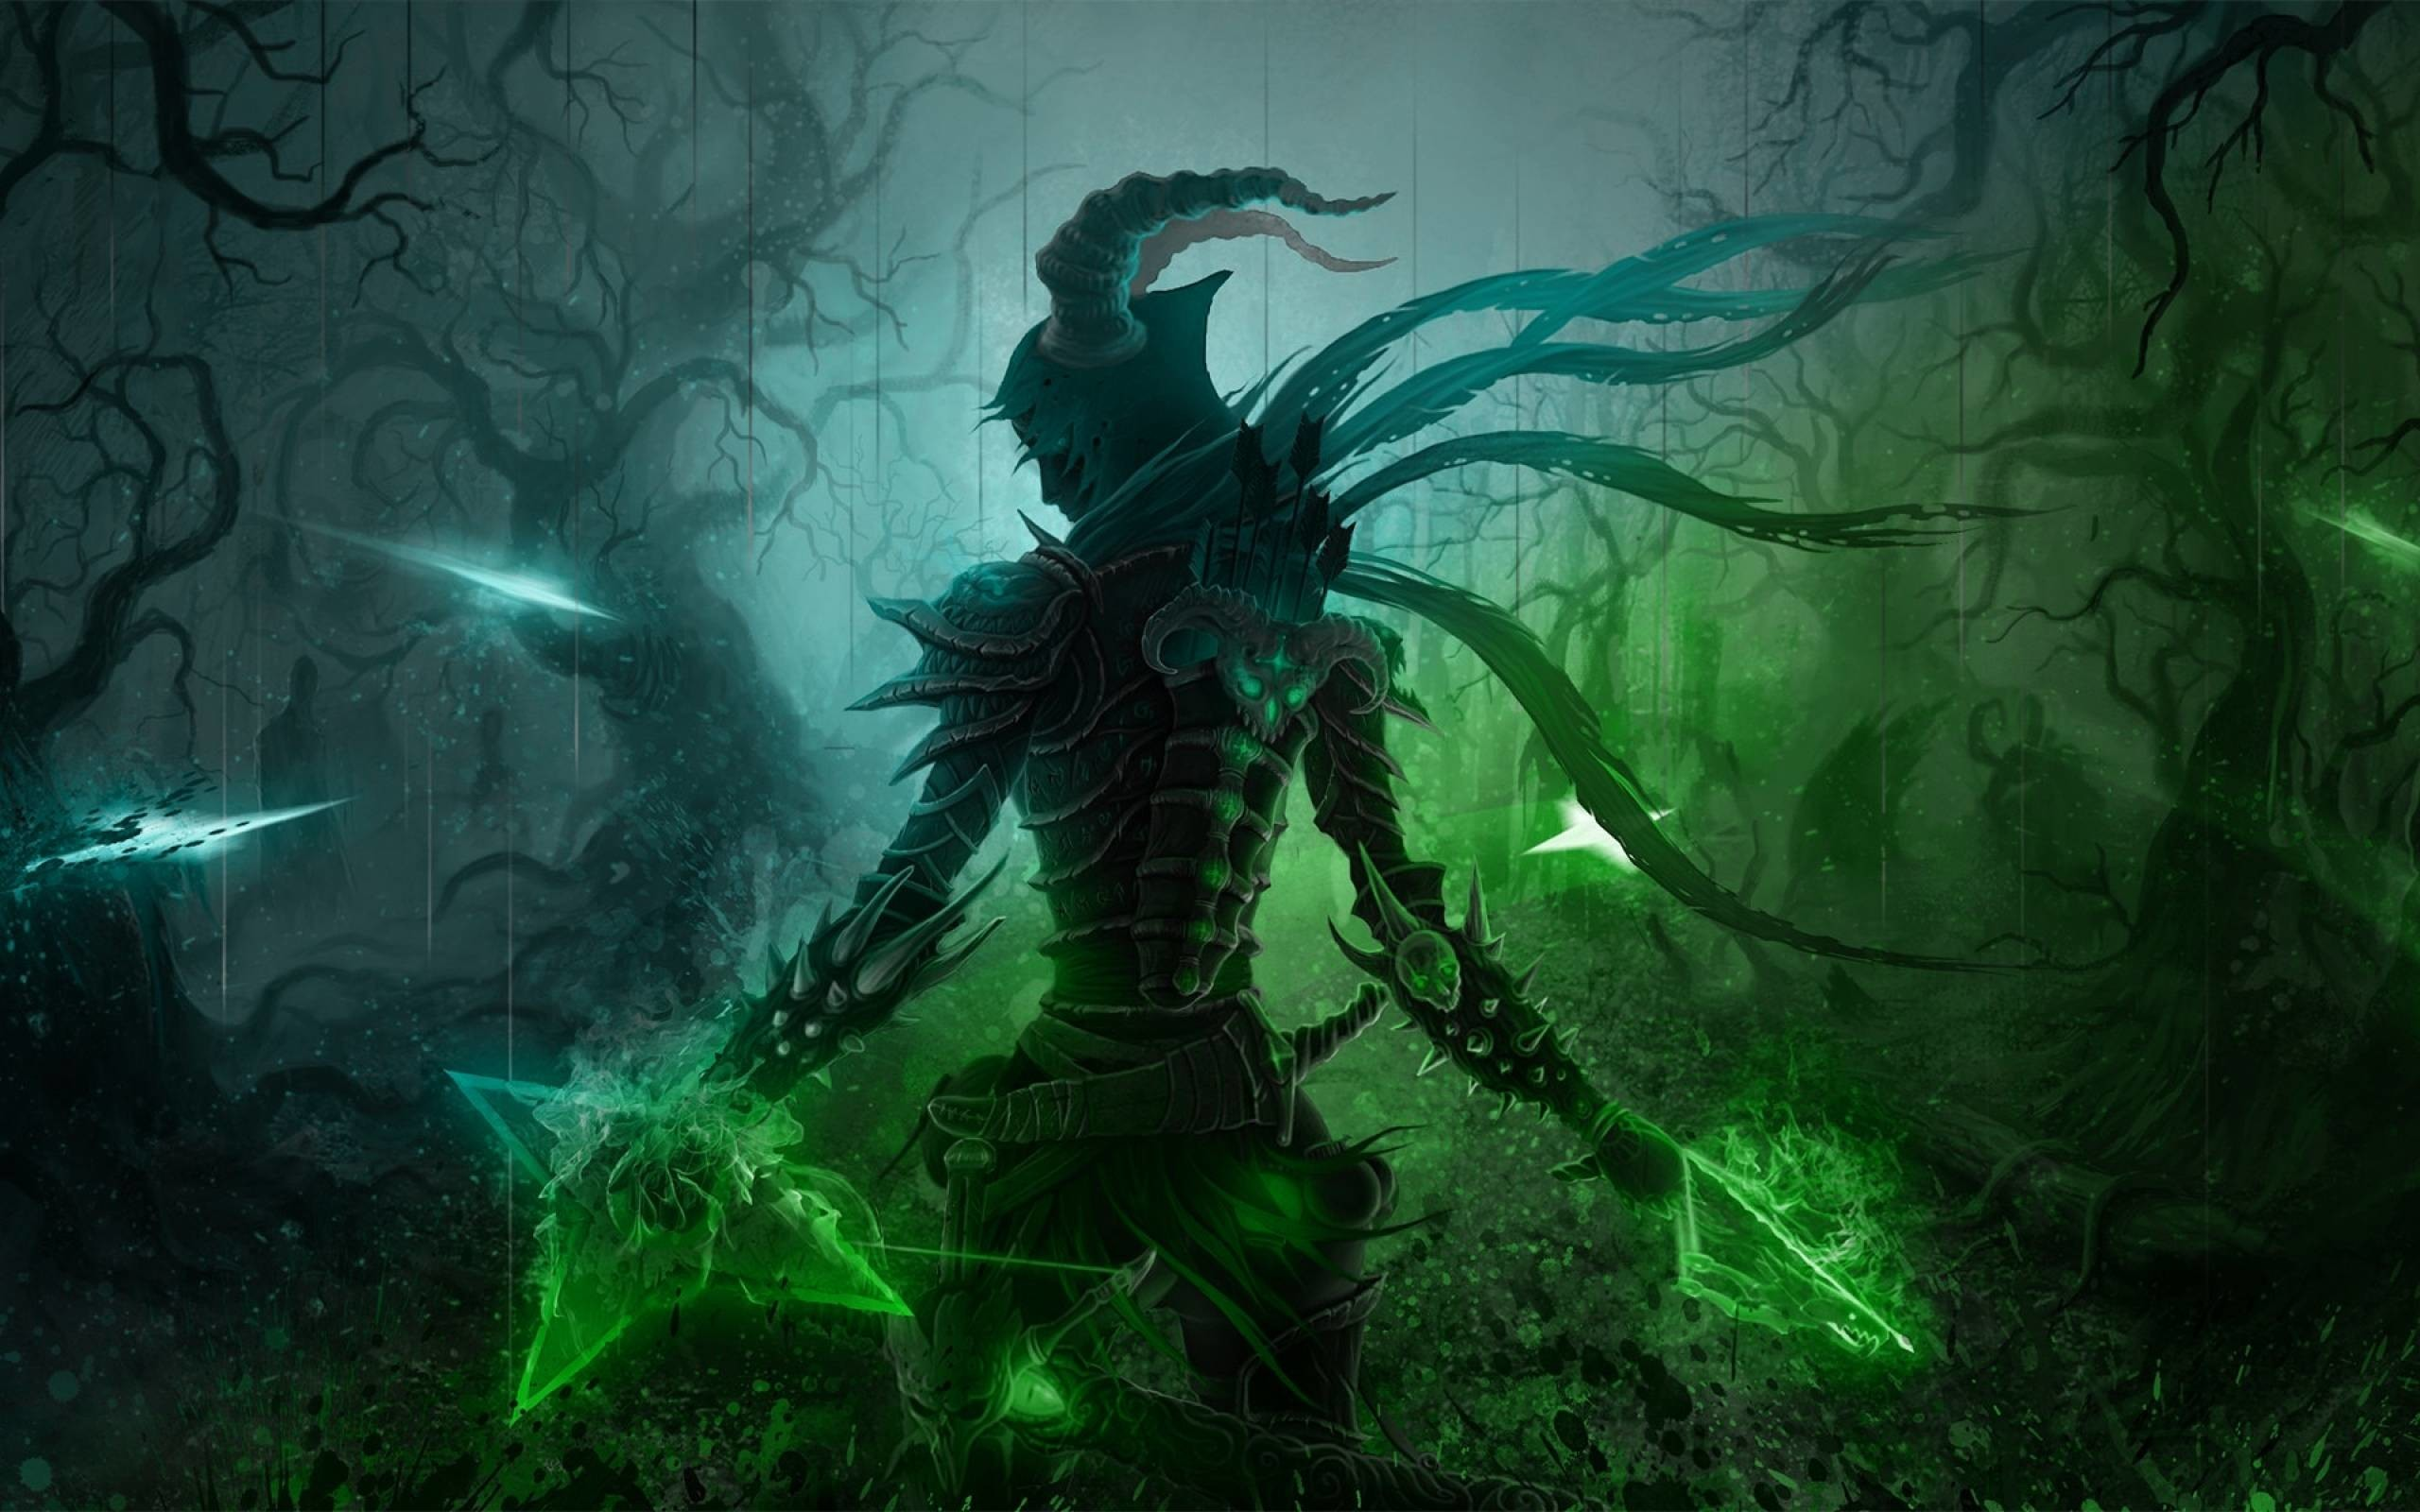 Diablo 3 Wallpaper Demon Hunter 2295182 Hd Wallpaper